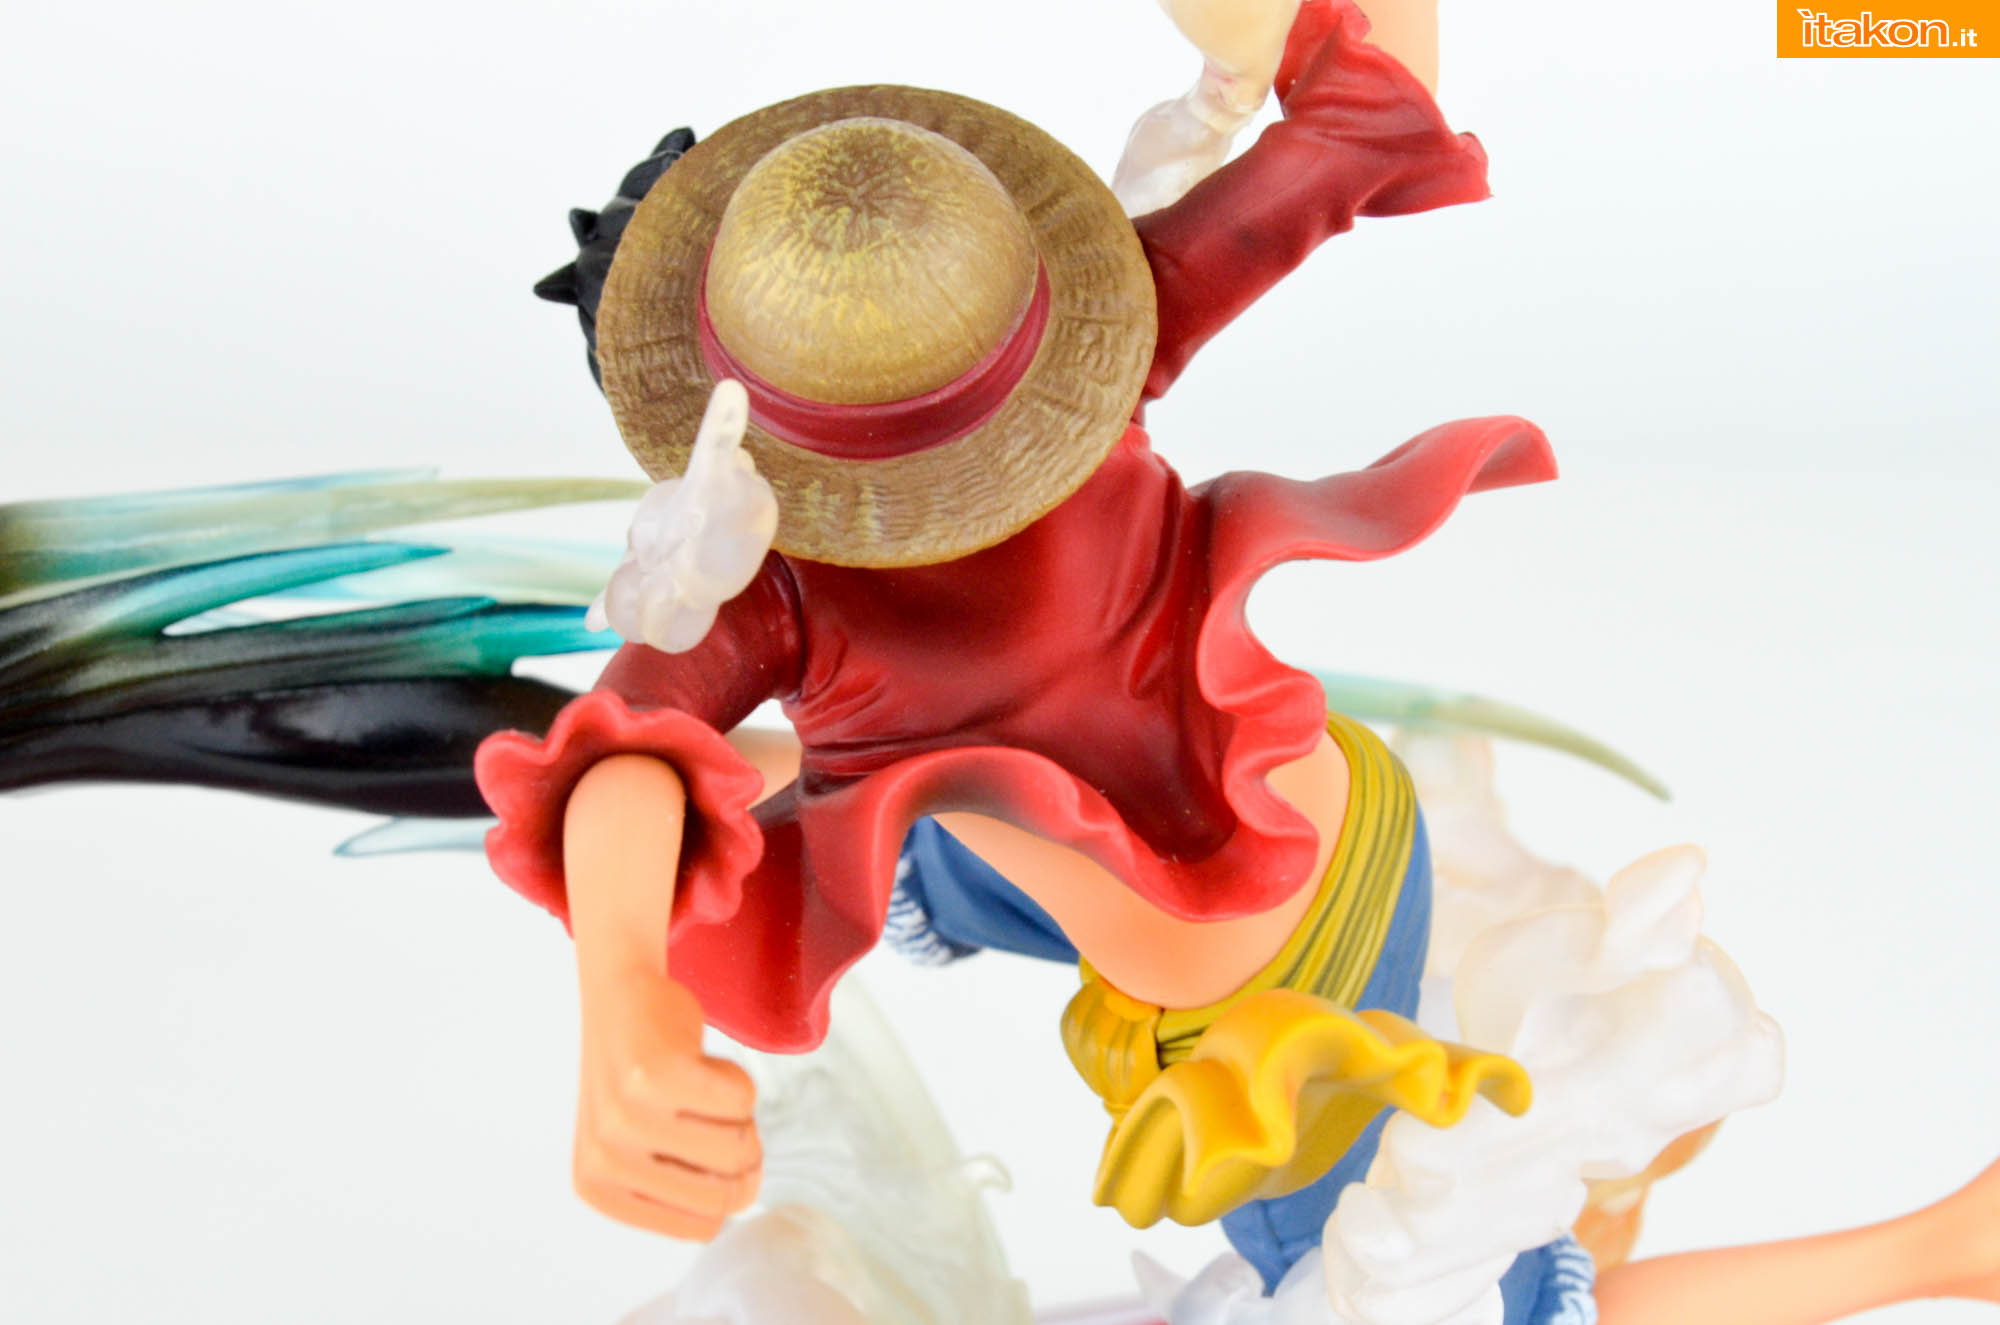 Bandai_Luffy_Figuarts_ZERO_review-27